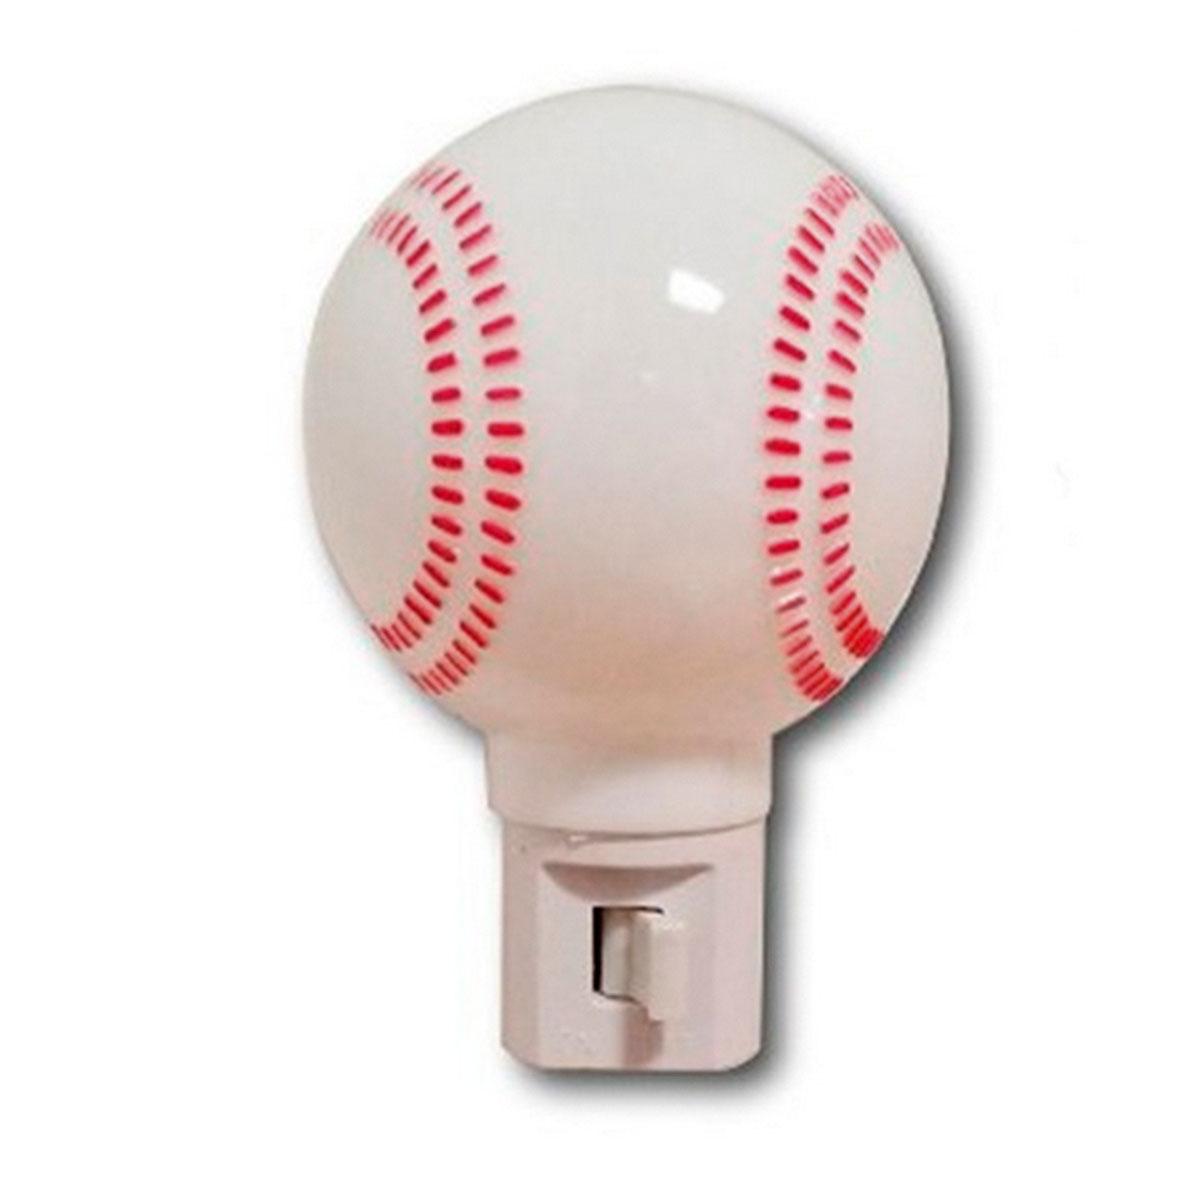 Lampara Luz De Noche Pelota Beisbol Niños Hogar Recamara Foy